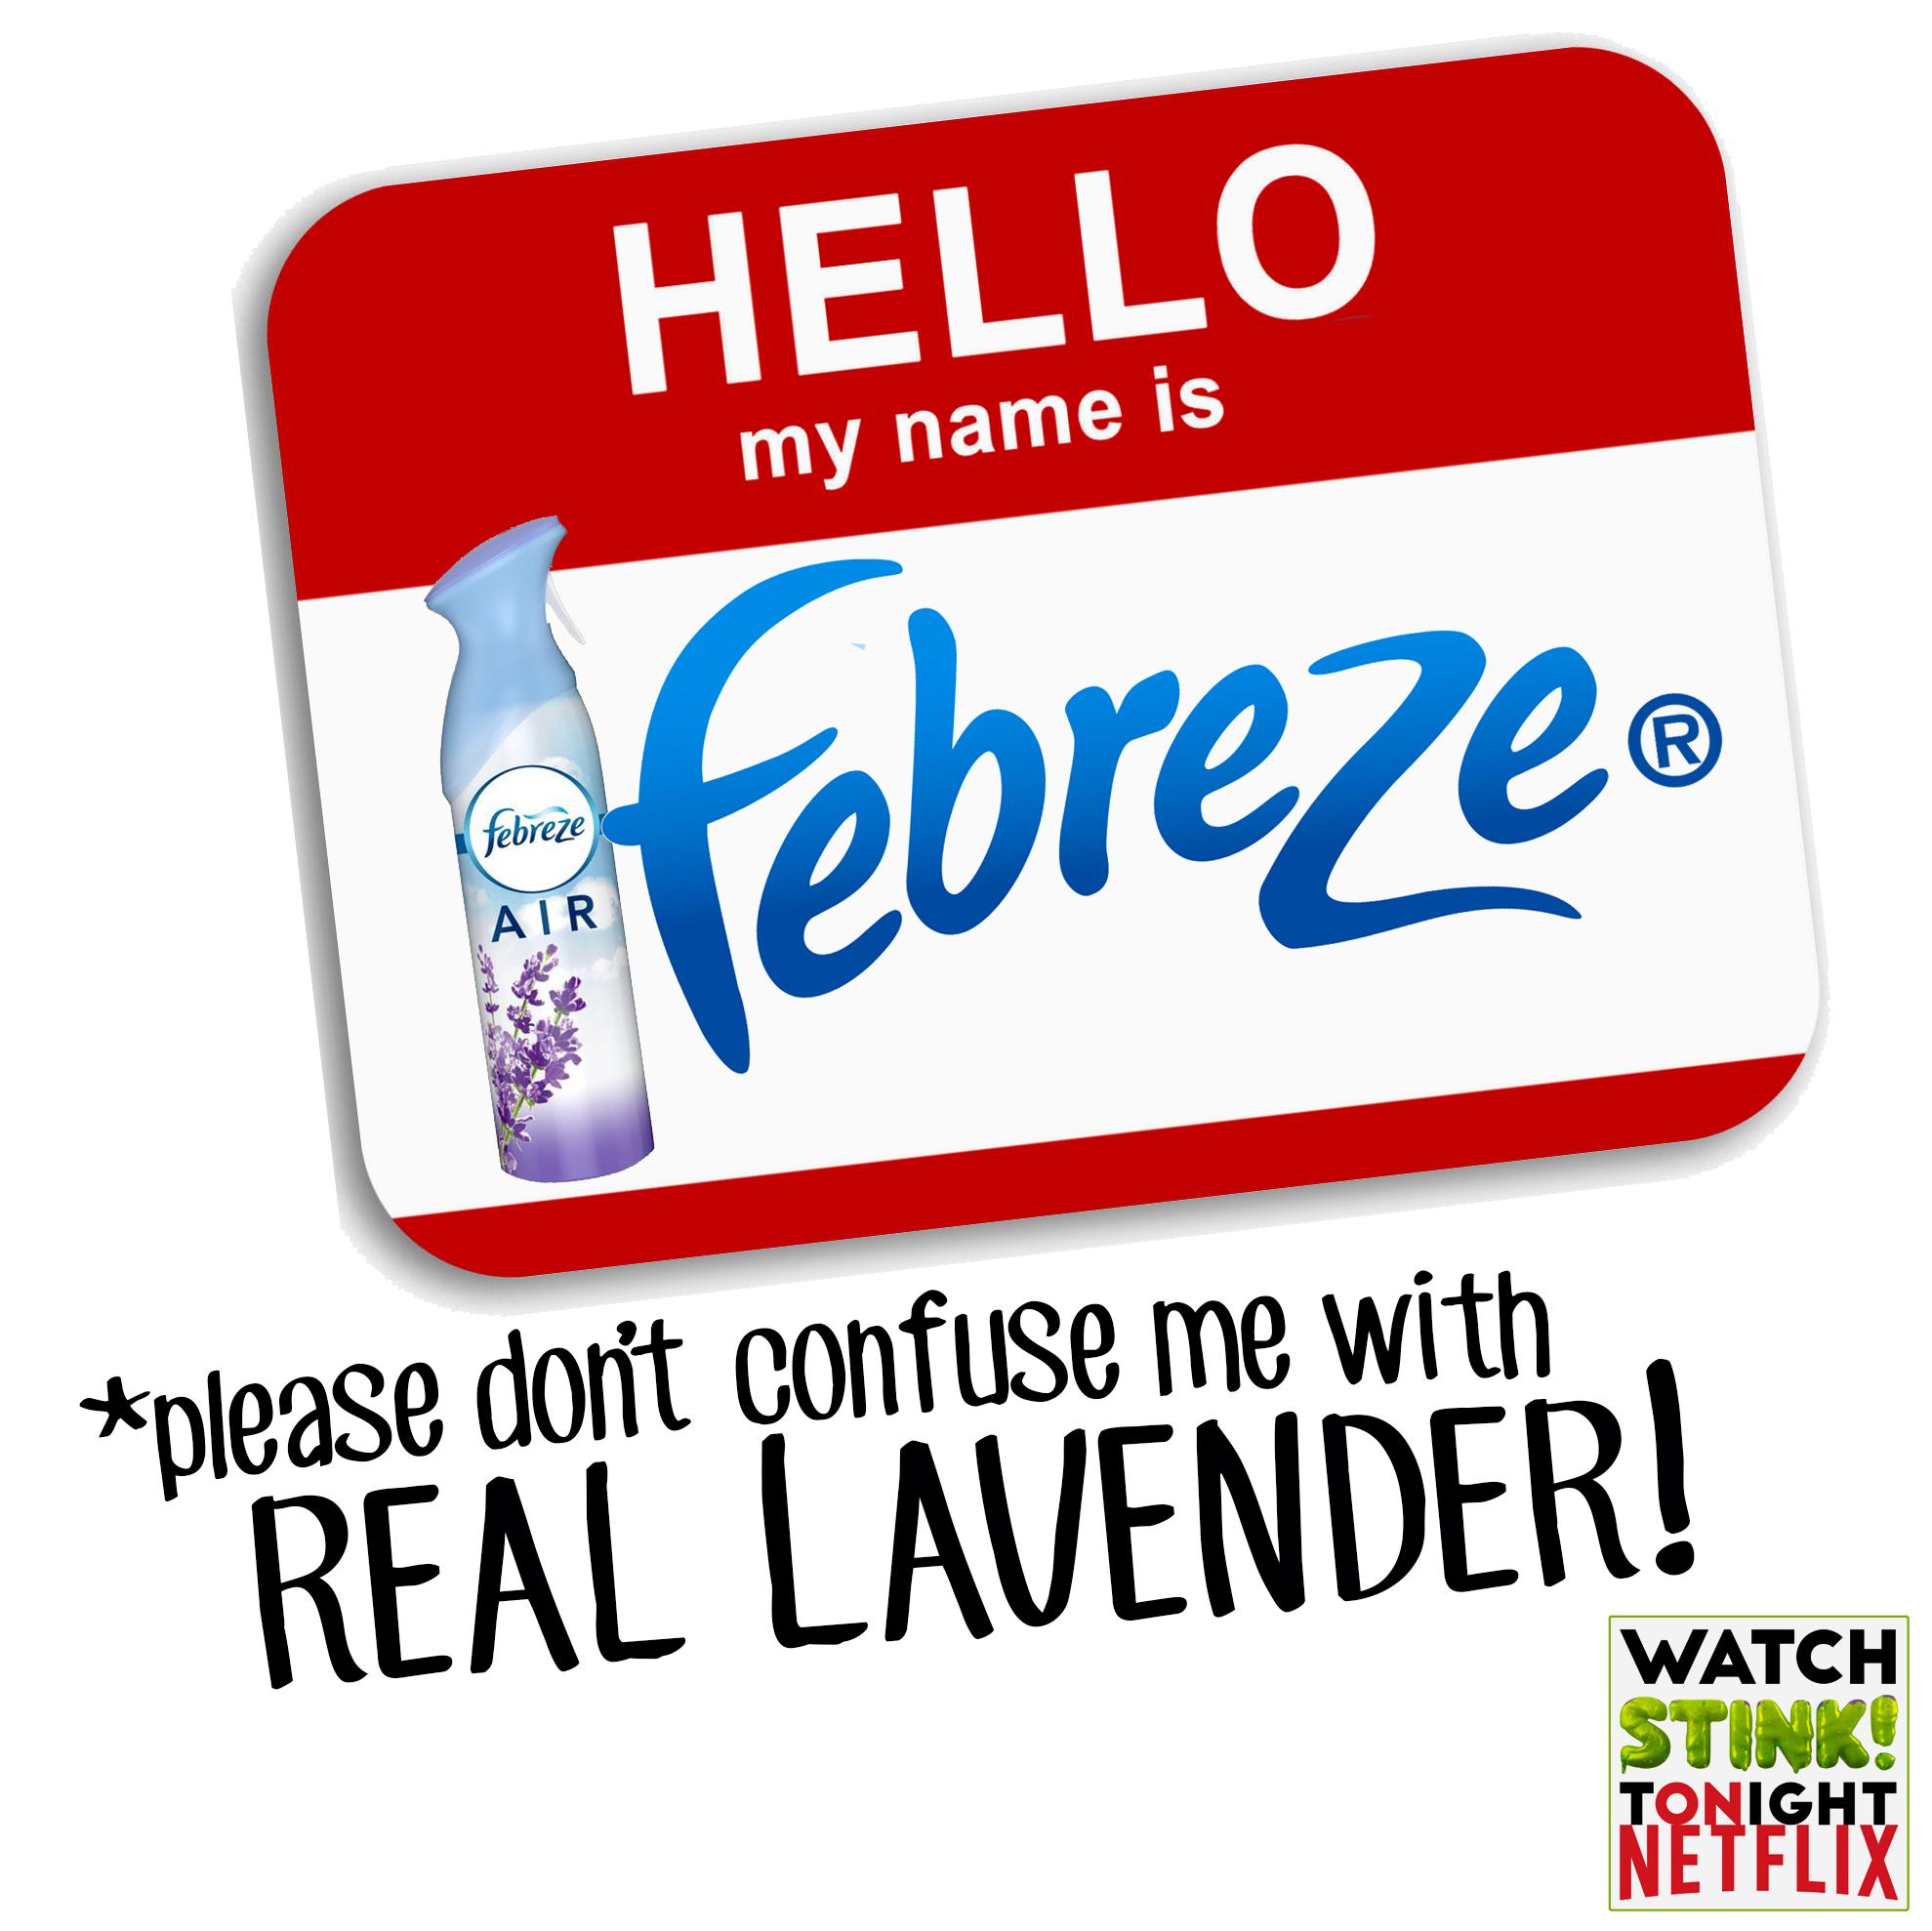 Hello-my-name-is-febreze.jpg